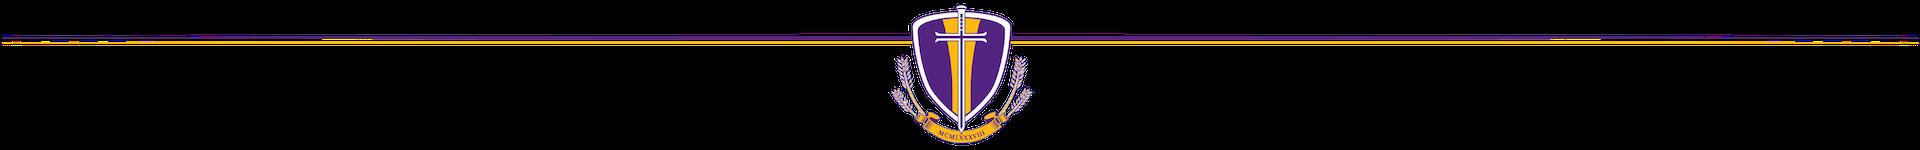 Trinity+Divider+Logo.png